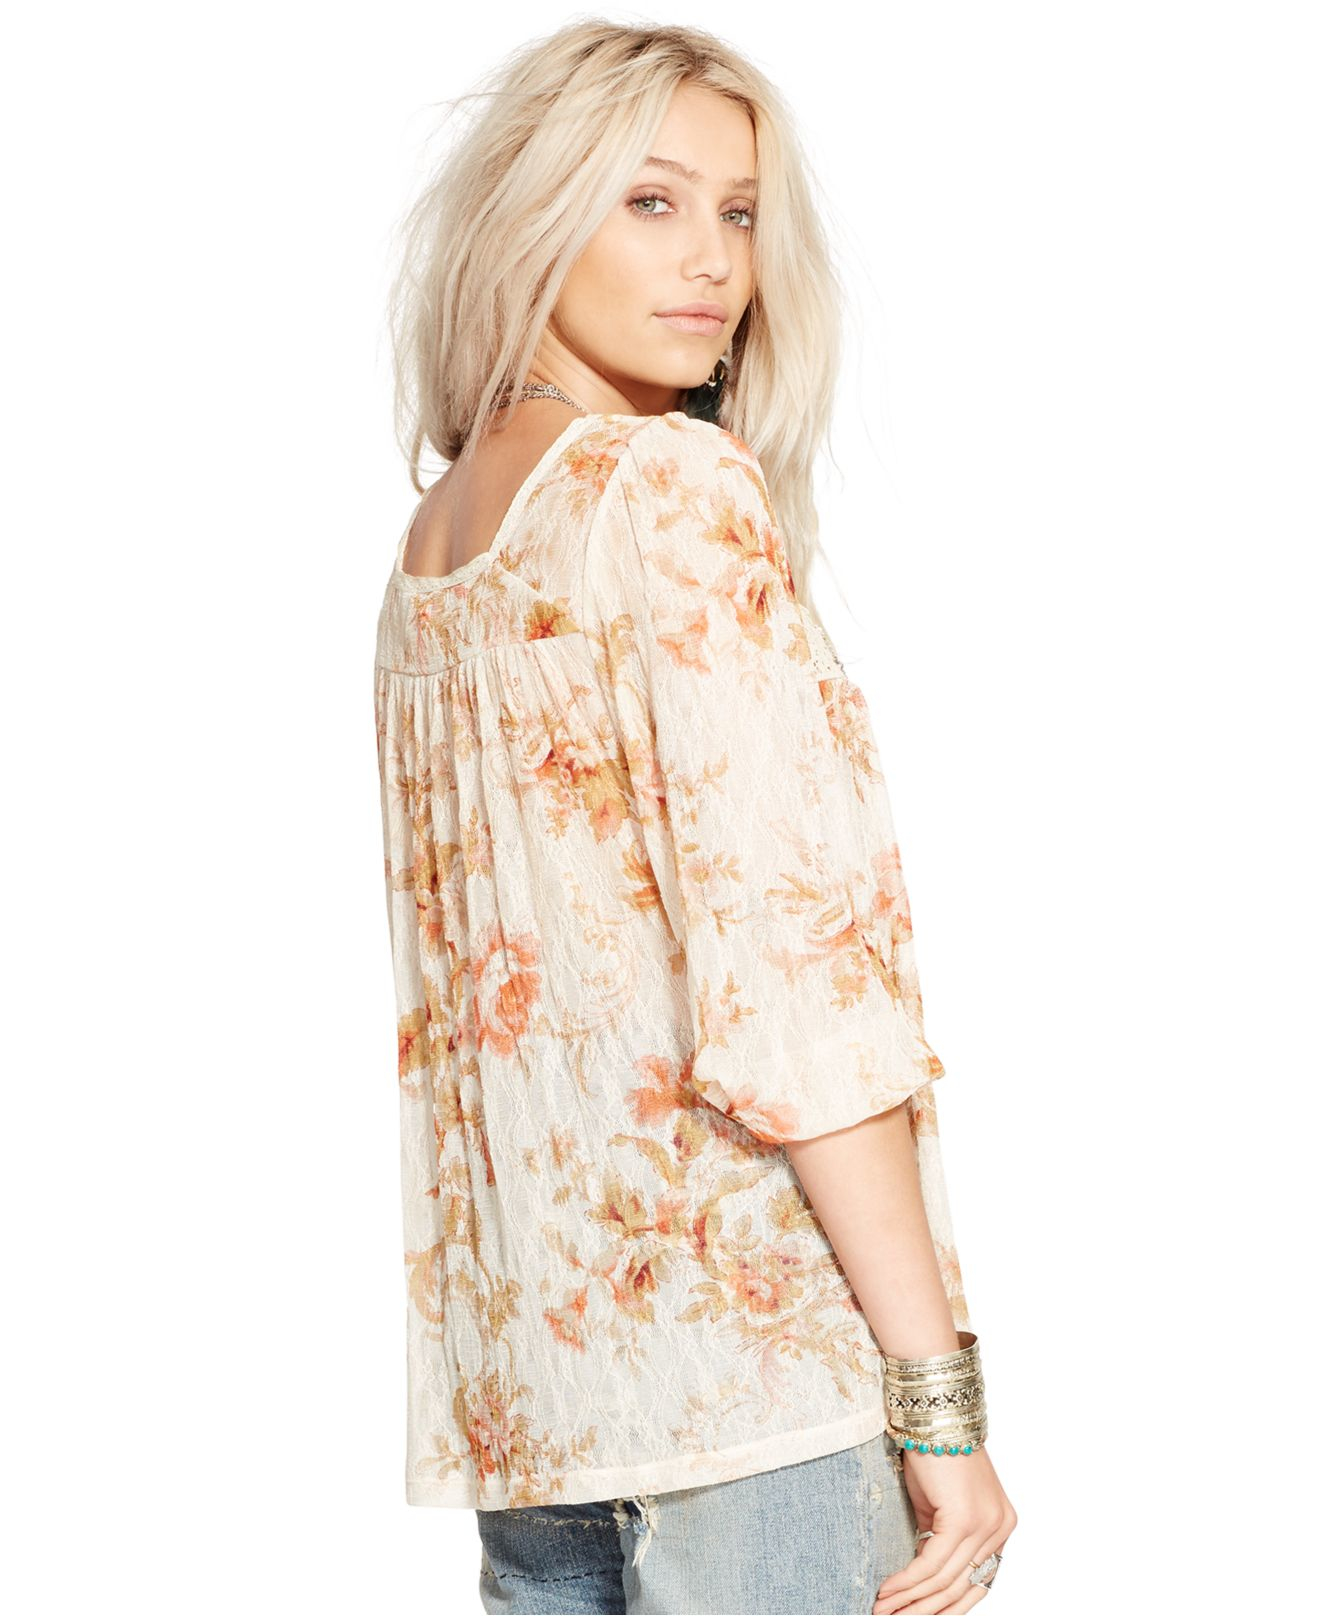 a1caafa7467cbb Macys Womens Ralph Lauren Polo Shirts – EDGE Engineering and ...